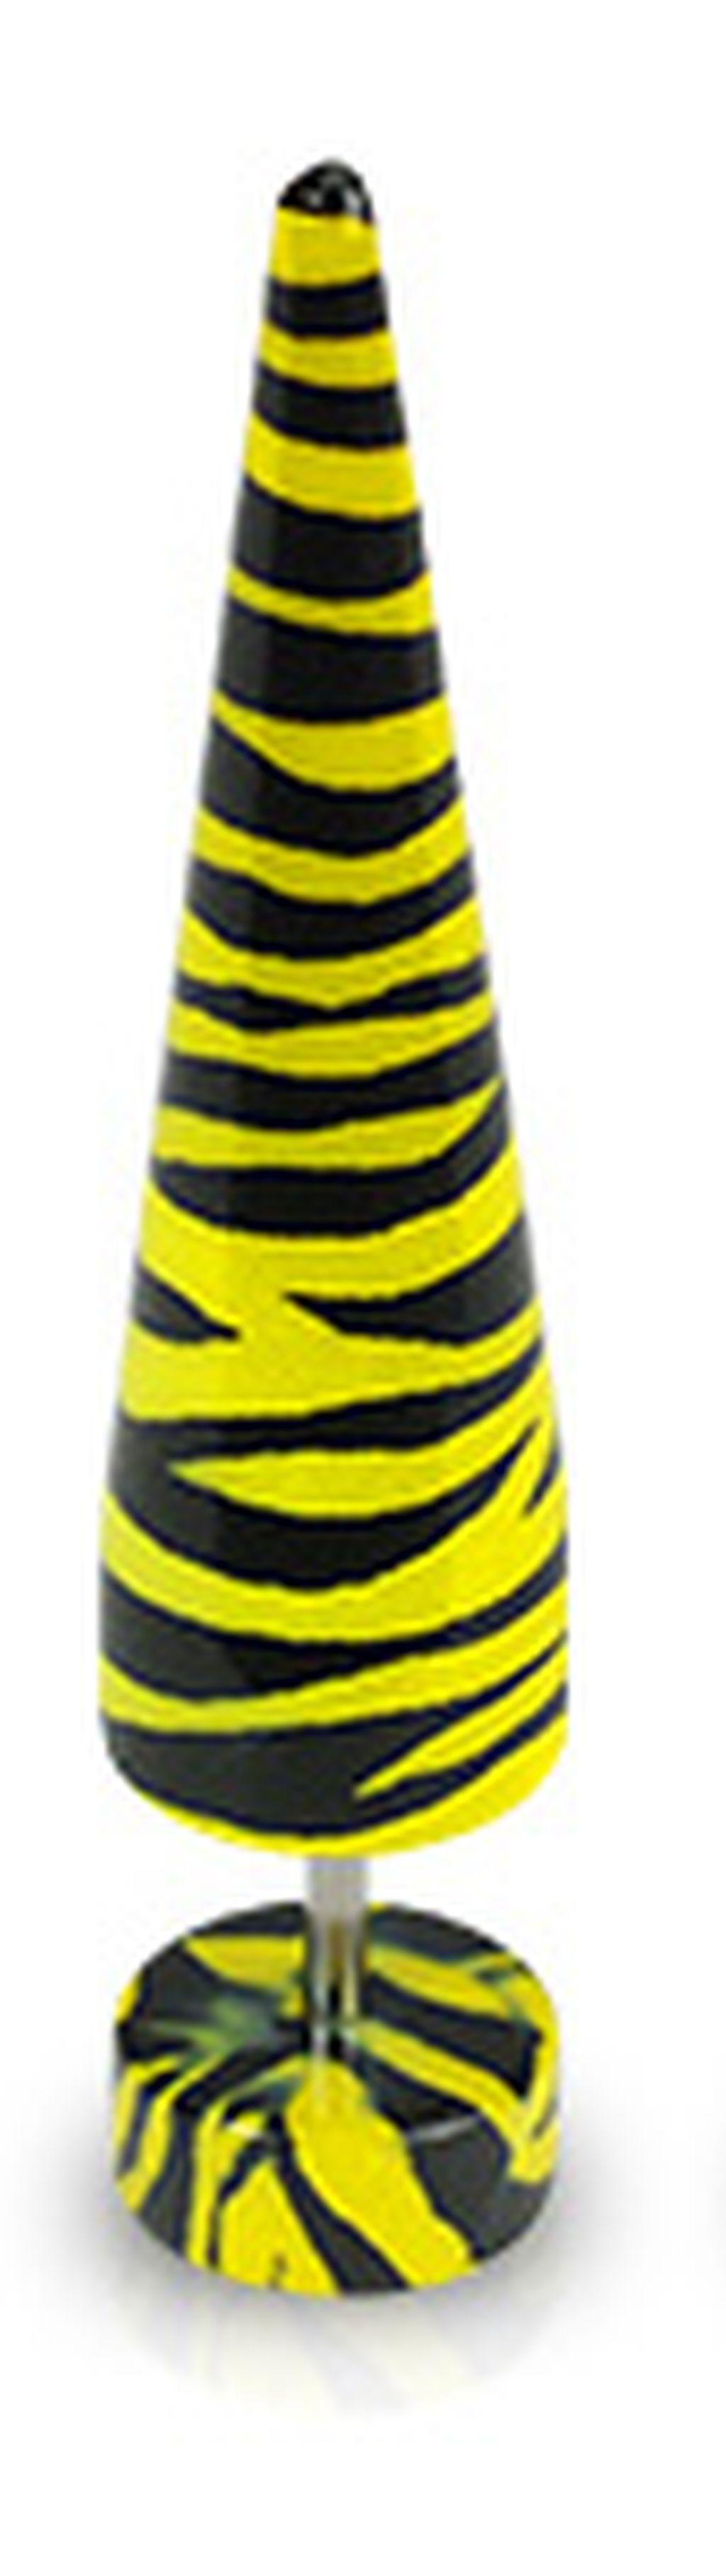 tiger_print_acrylic_taper_pair_yellow_black_earrings_fake_plugs_and_piercing_jewelry_3.jpg